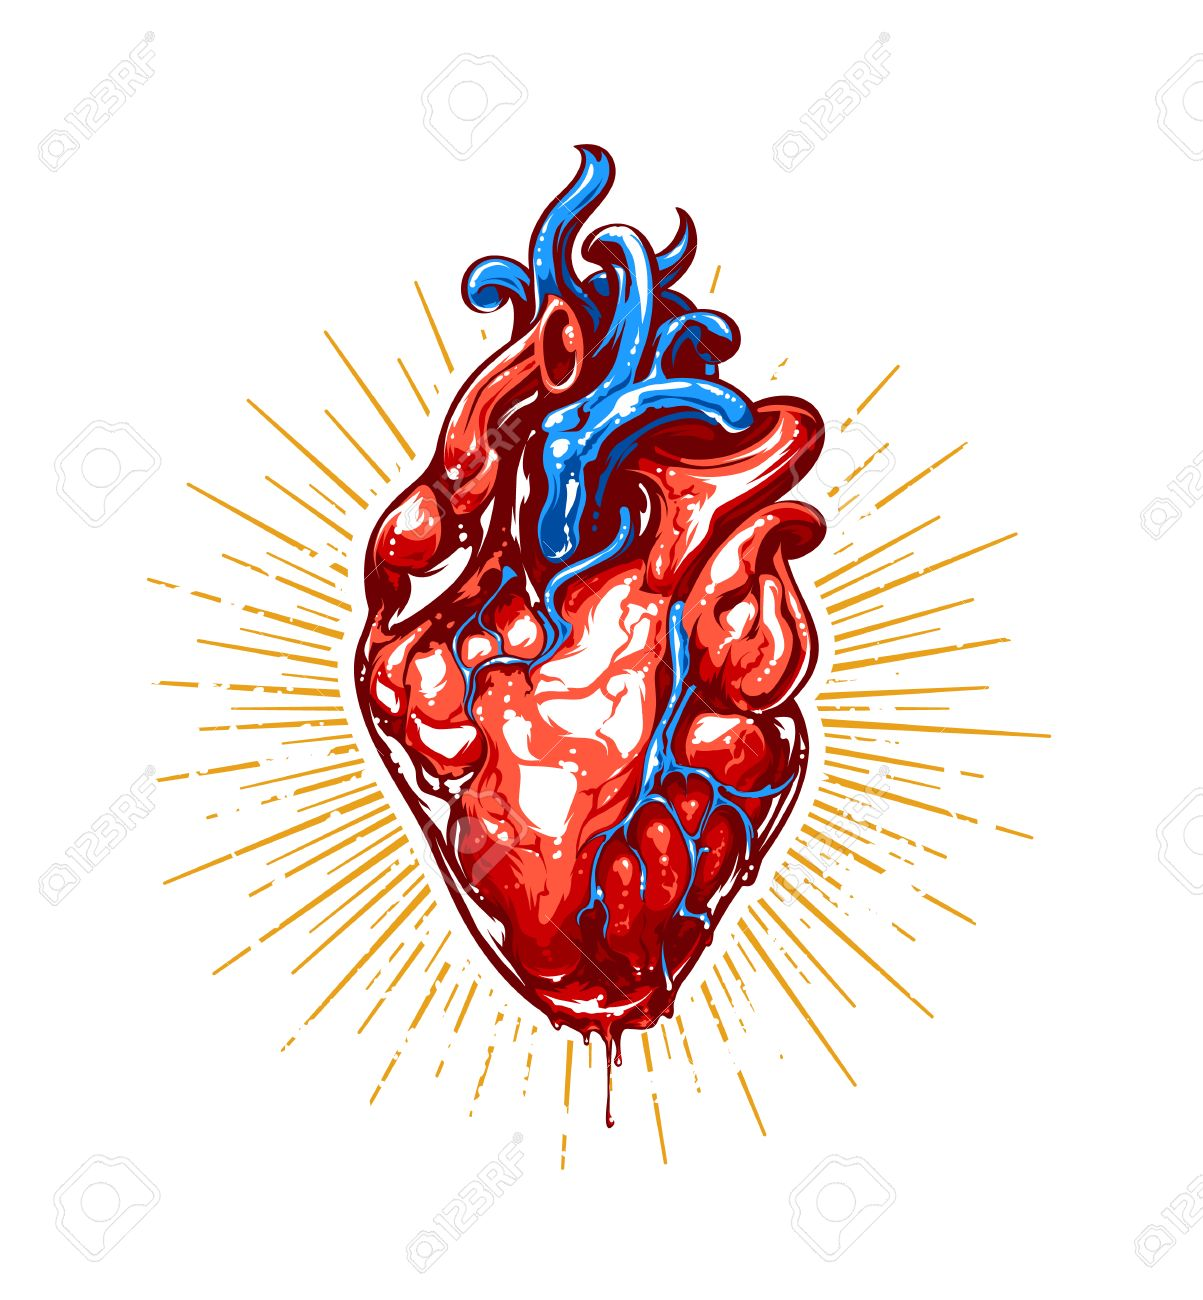 Anatomical Heart With Beams Vector Art Royalty Free Cliparts